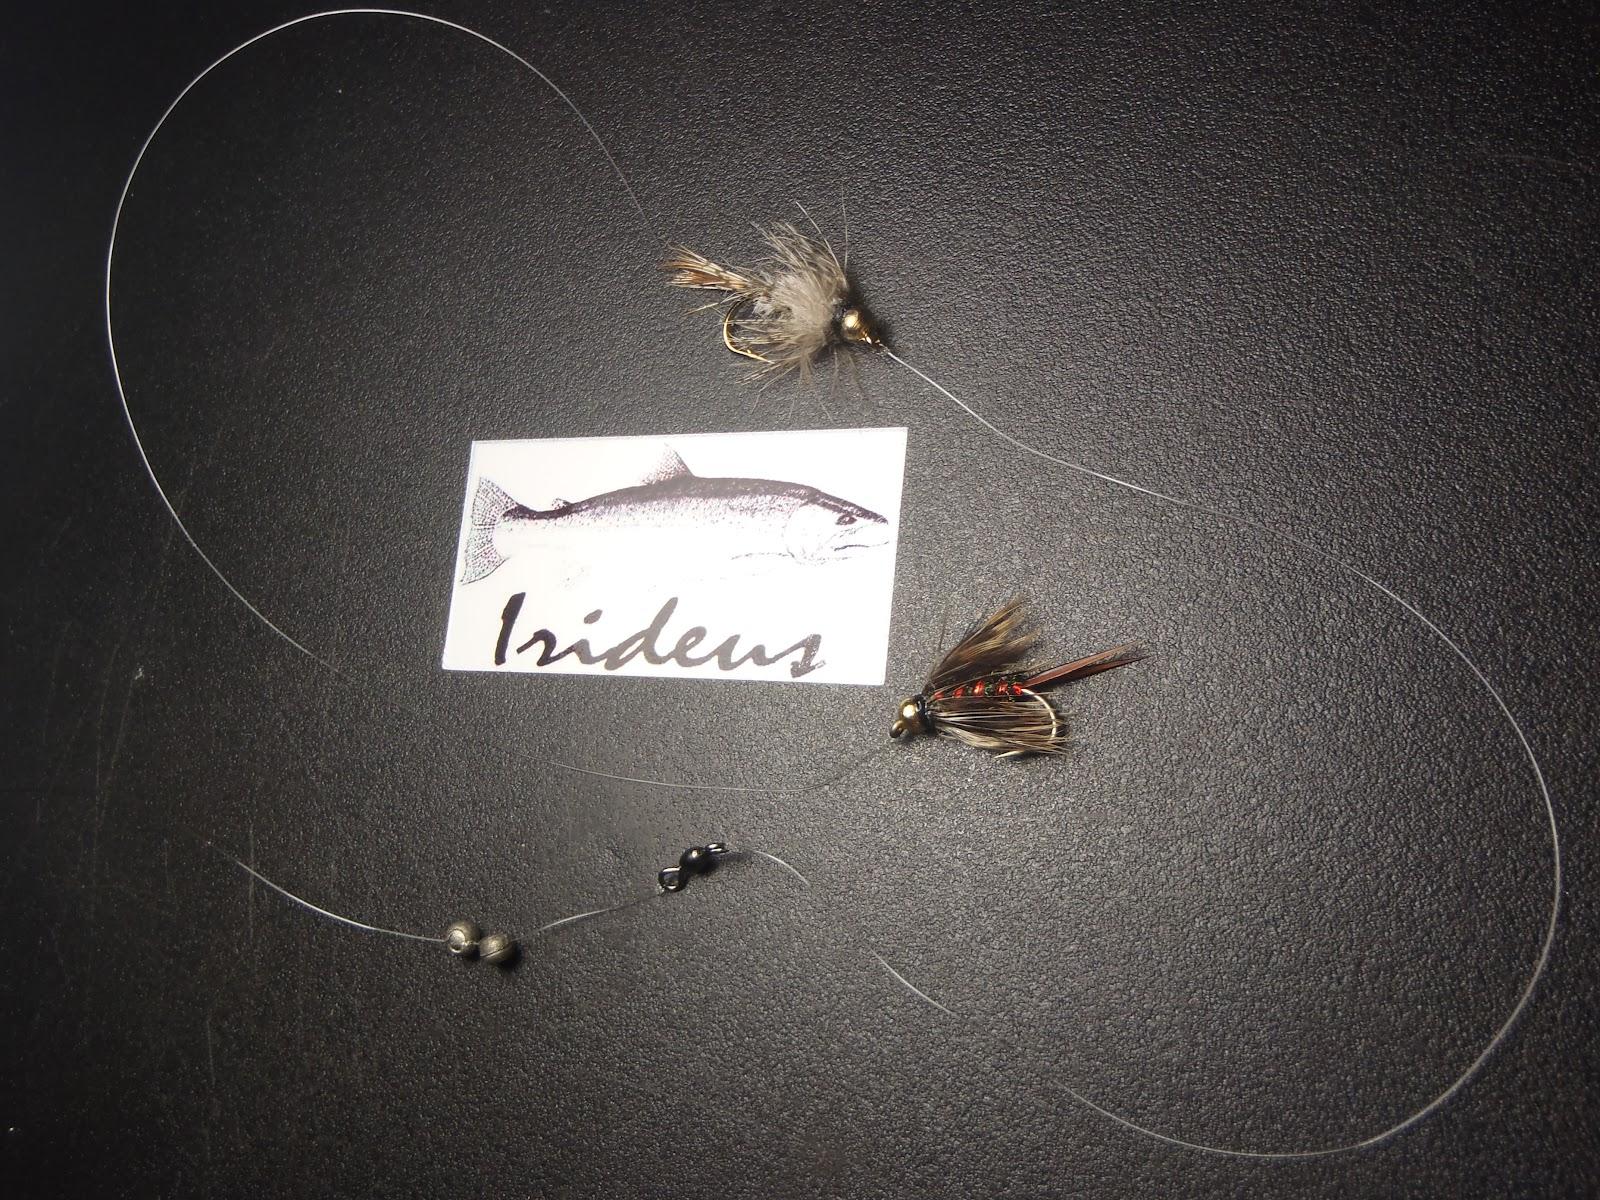 Irideus fly fishing products irideus fly fly fishing for Fly fishing split shot